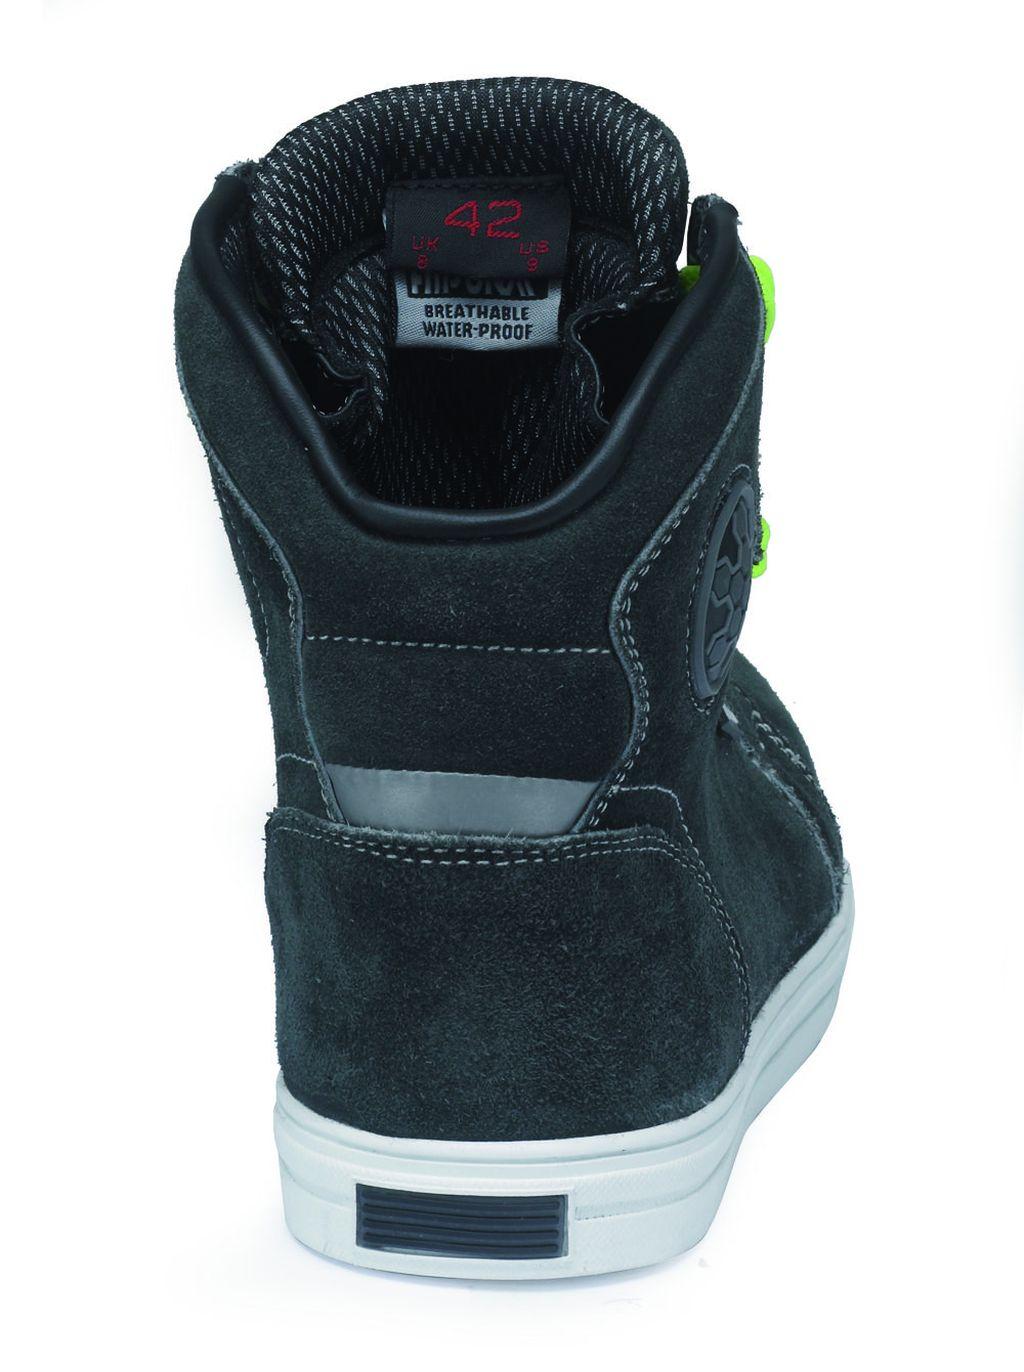 Motorrad Schuhe Allround Sneaker Kurzstiefel Twister Grau Gr.38 - 48 NEU